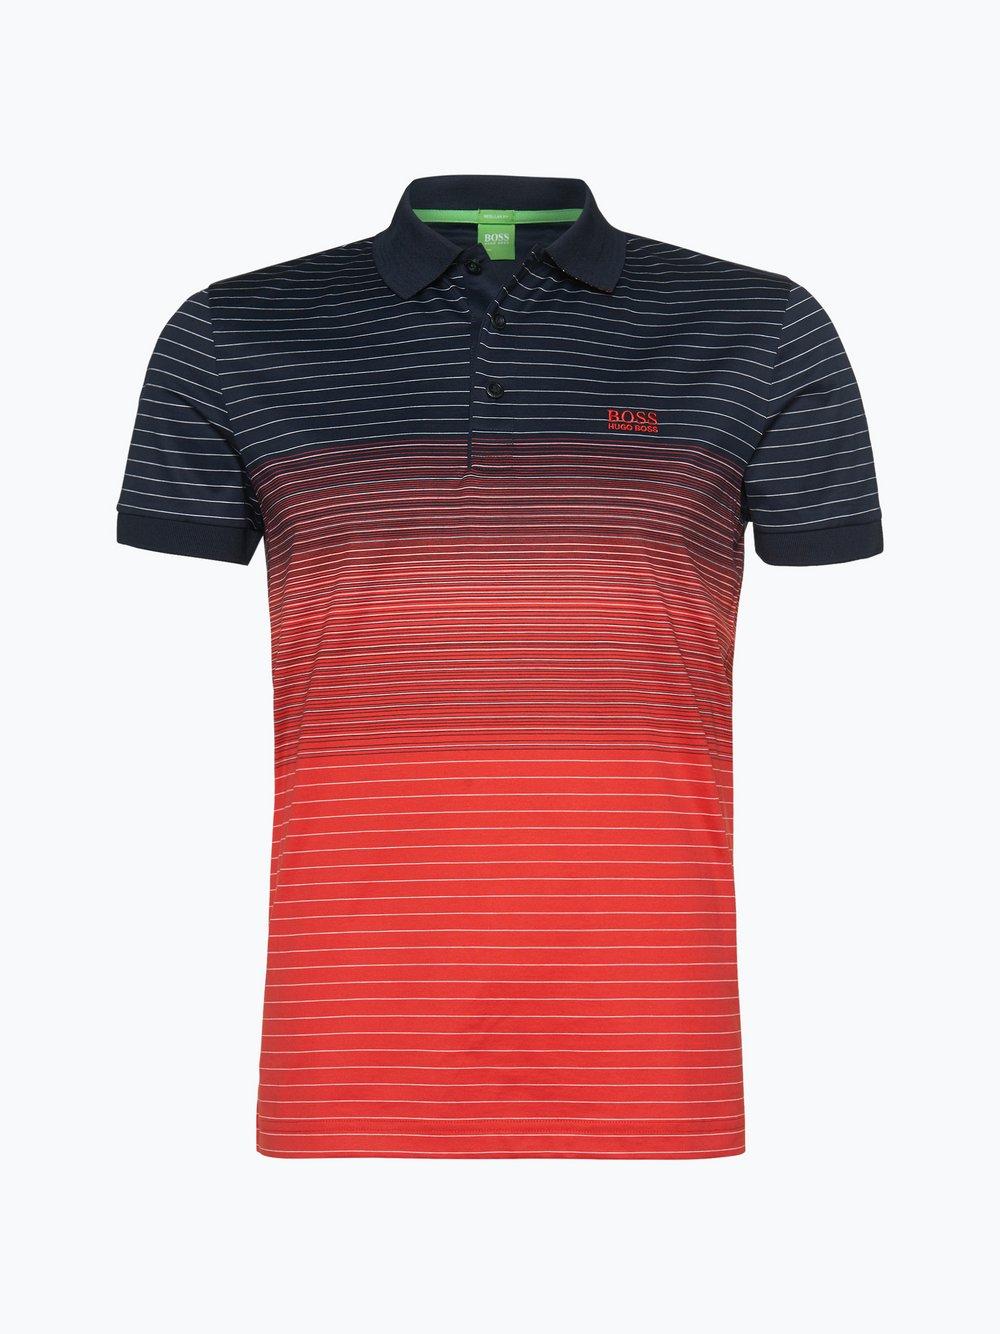 new style 74d97 7394b BOSS Athleisure Herren Poloshirt - Paddy 3 online kaufen ...